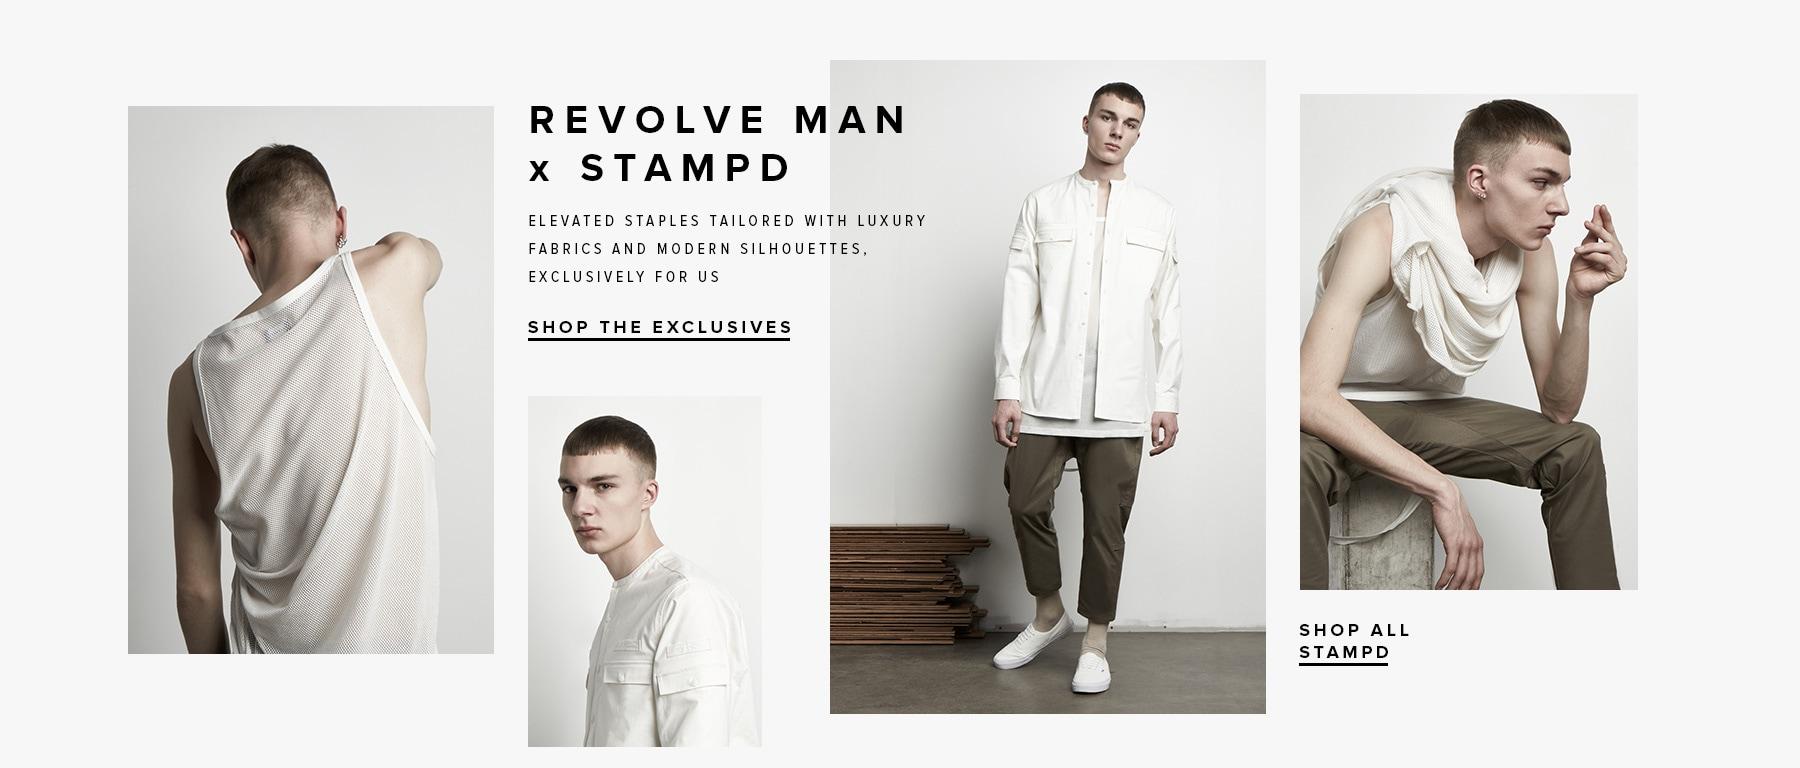 REVOLVE MAN x STAMPD